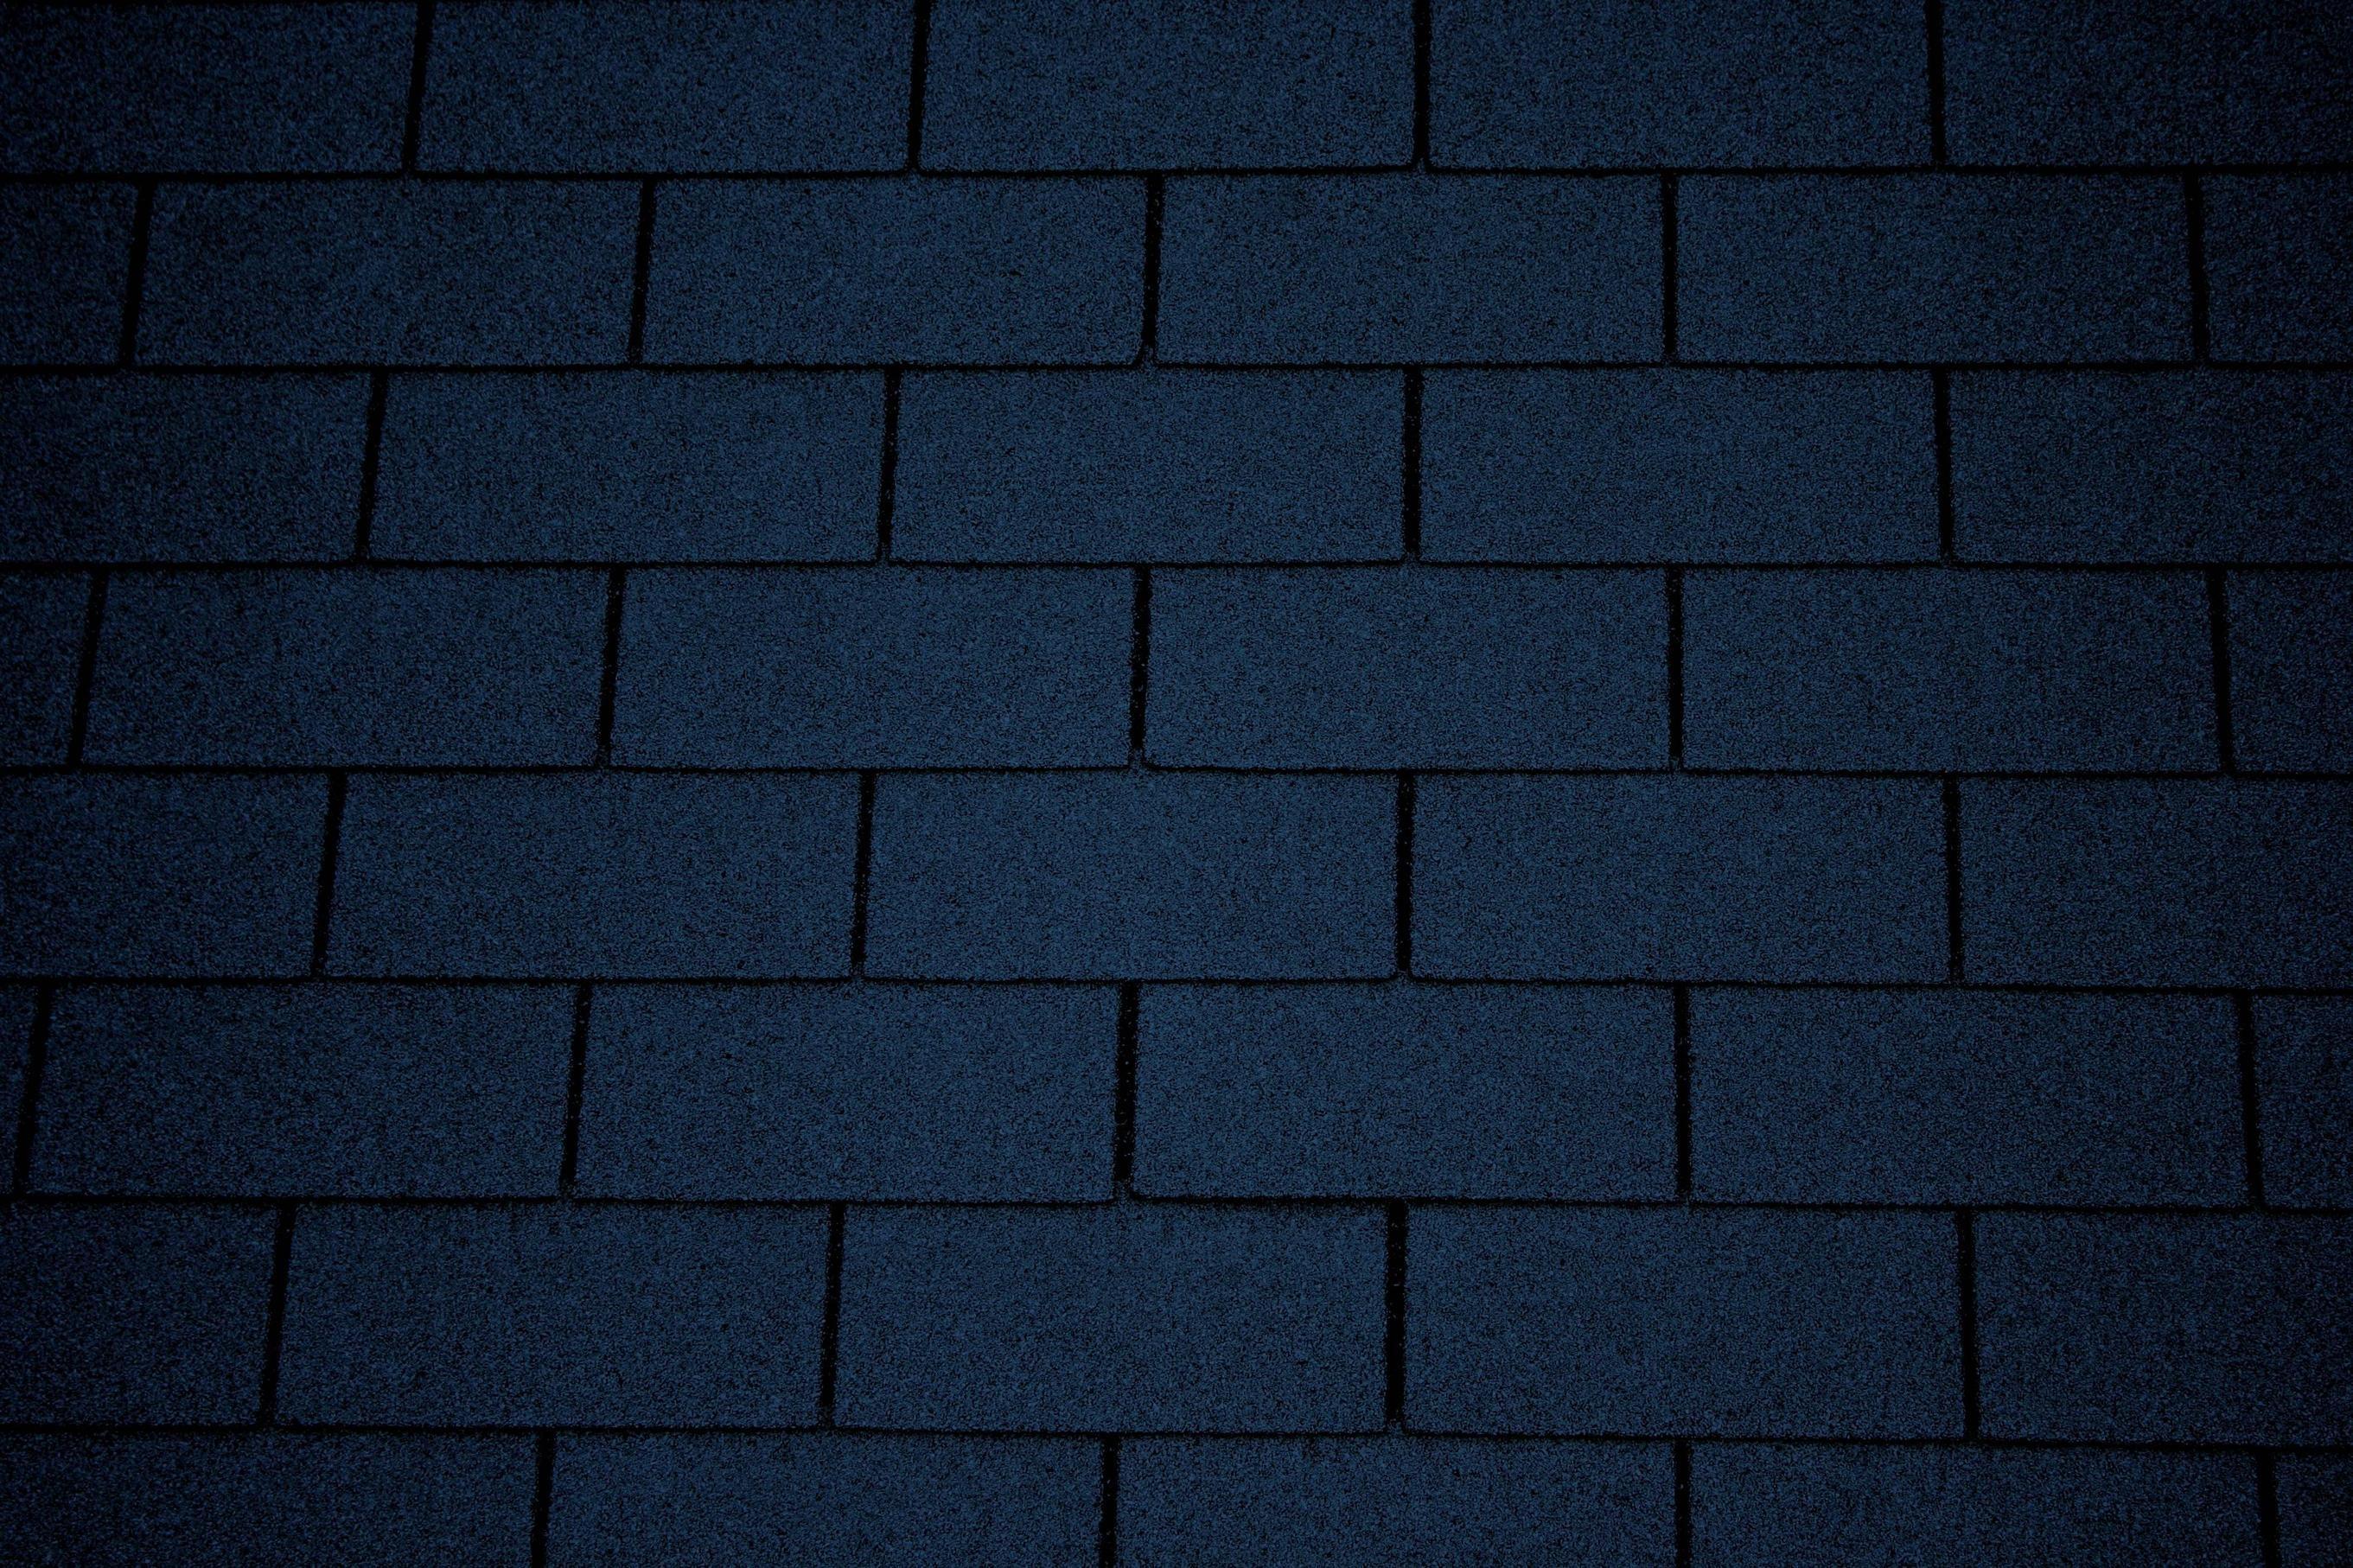 Navy Blue Wallpaper Verdewall